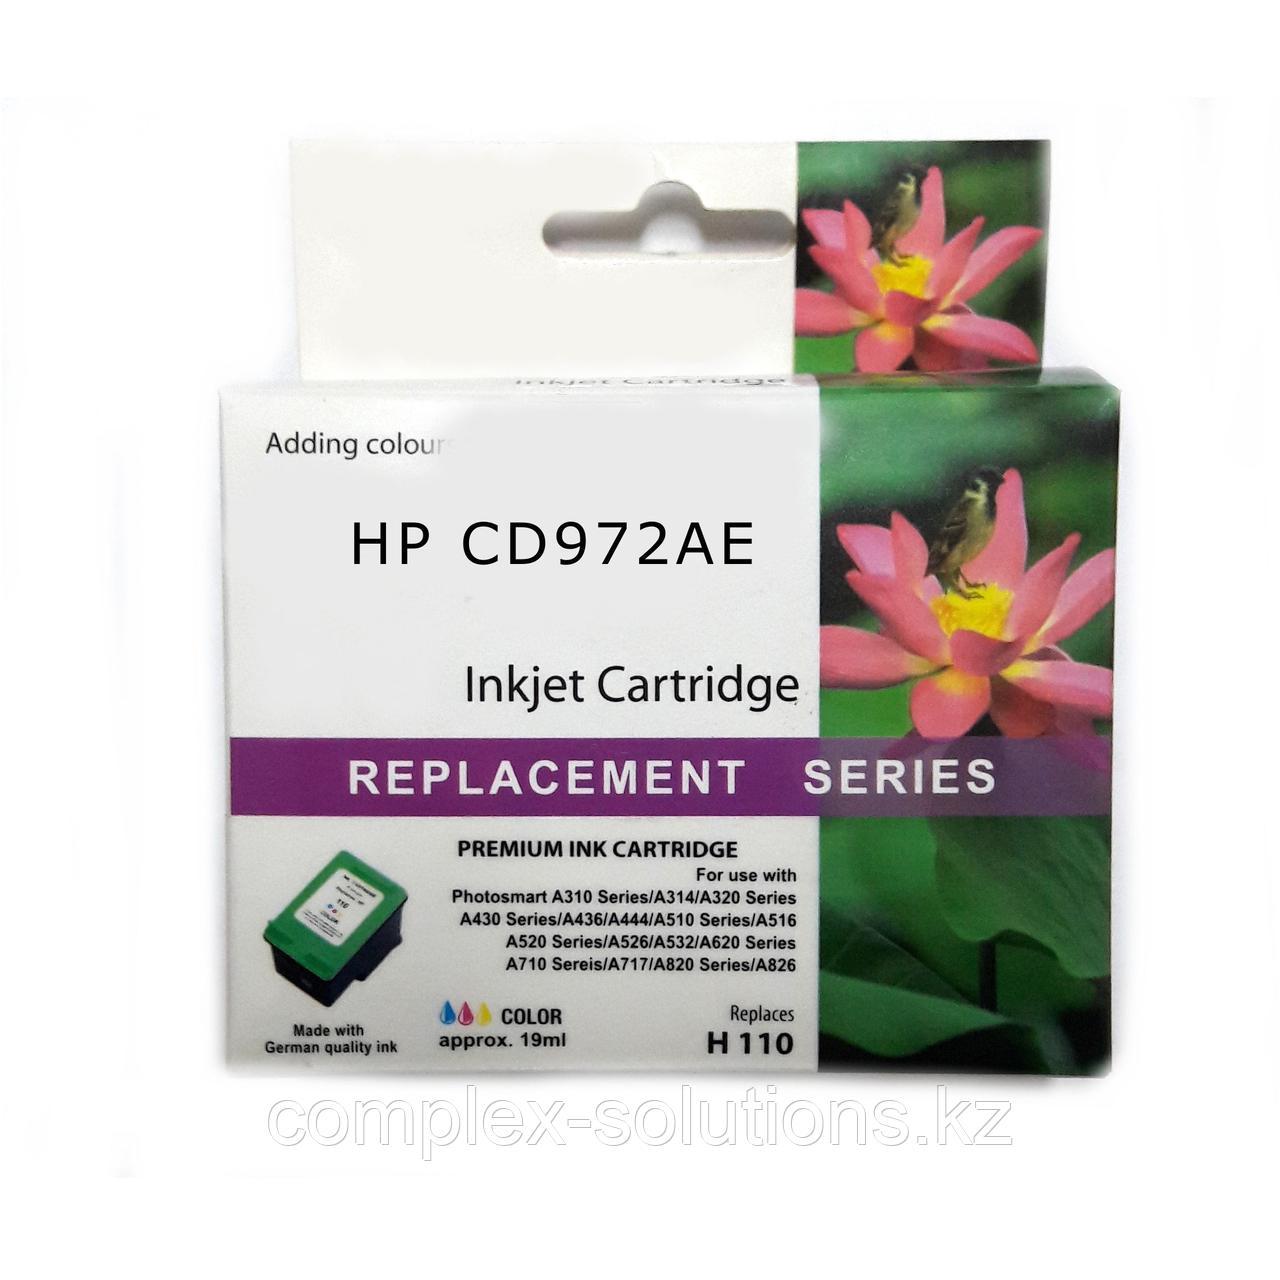 Картридж HP CD972AE Cyan №920 JET TEK   [качественный дубликат]